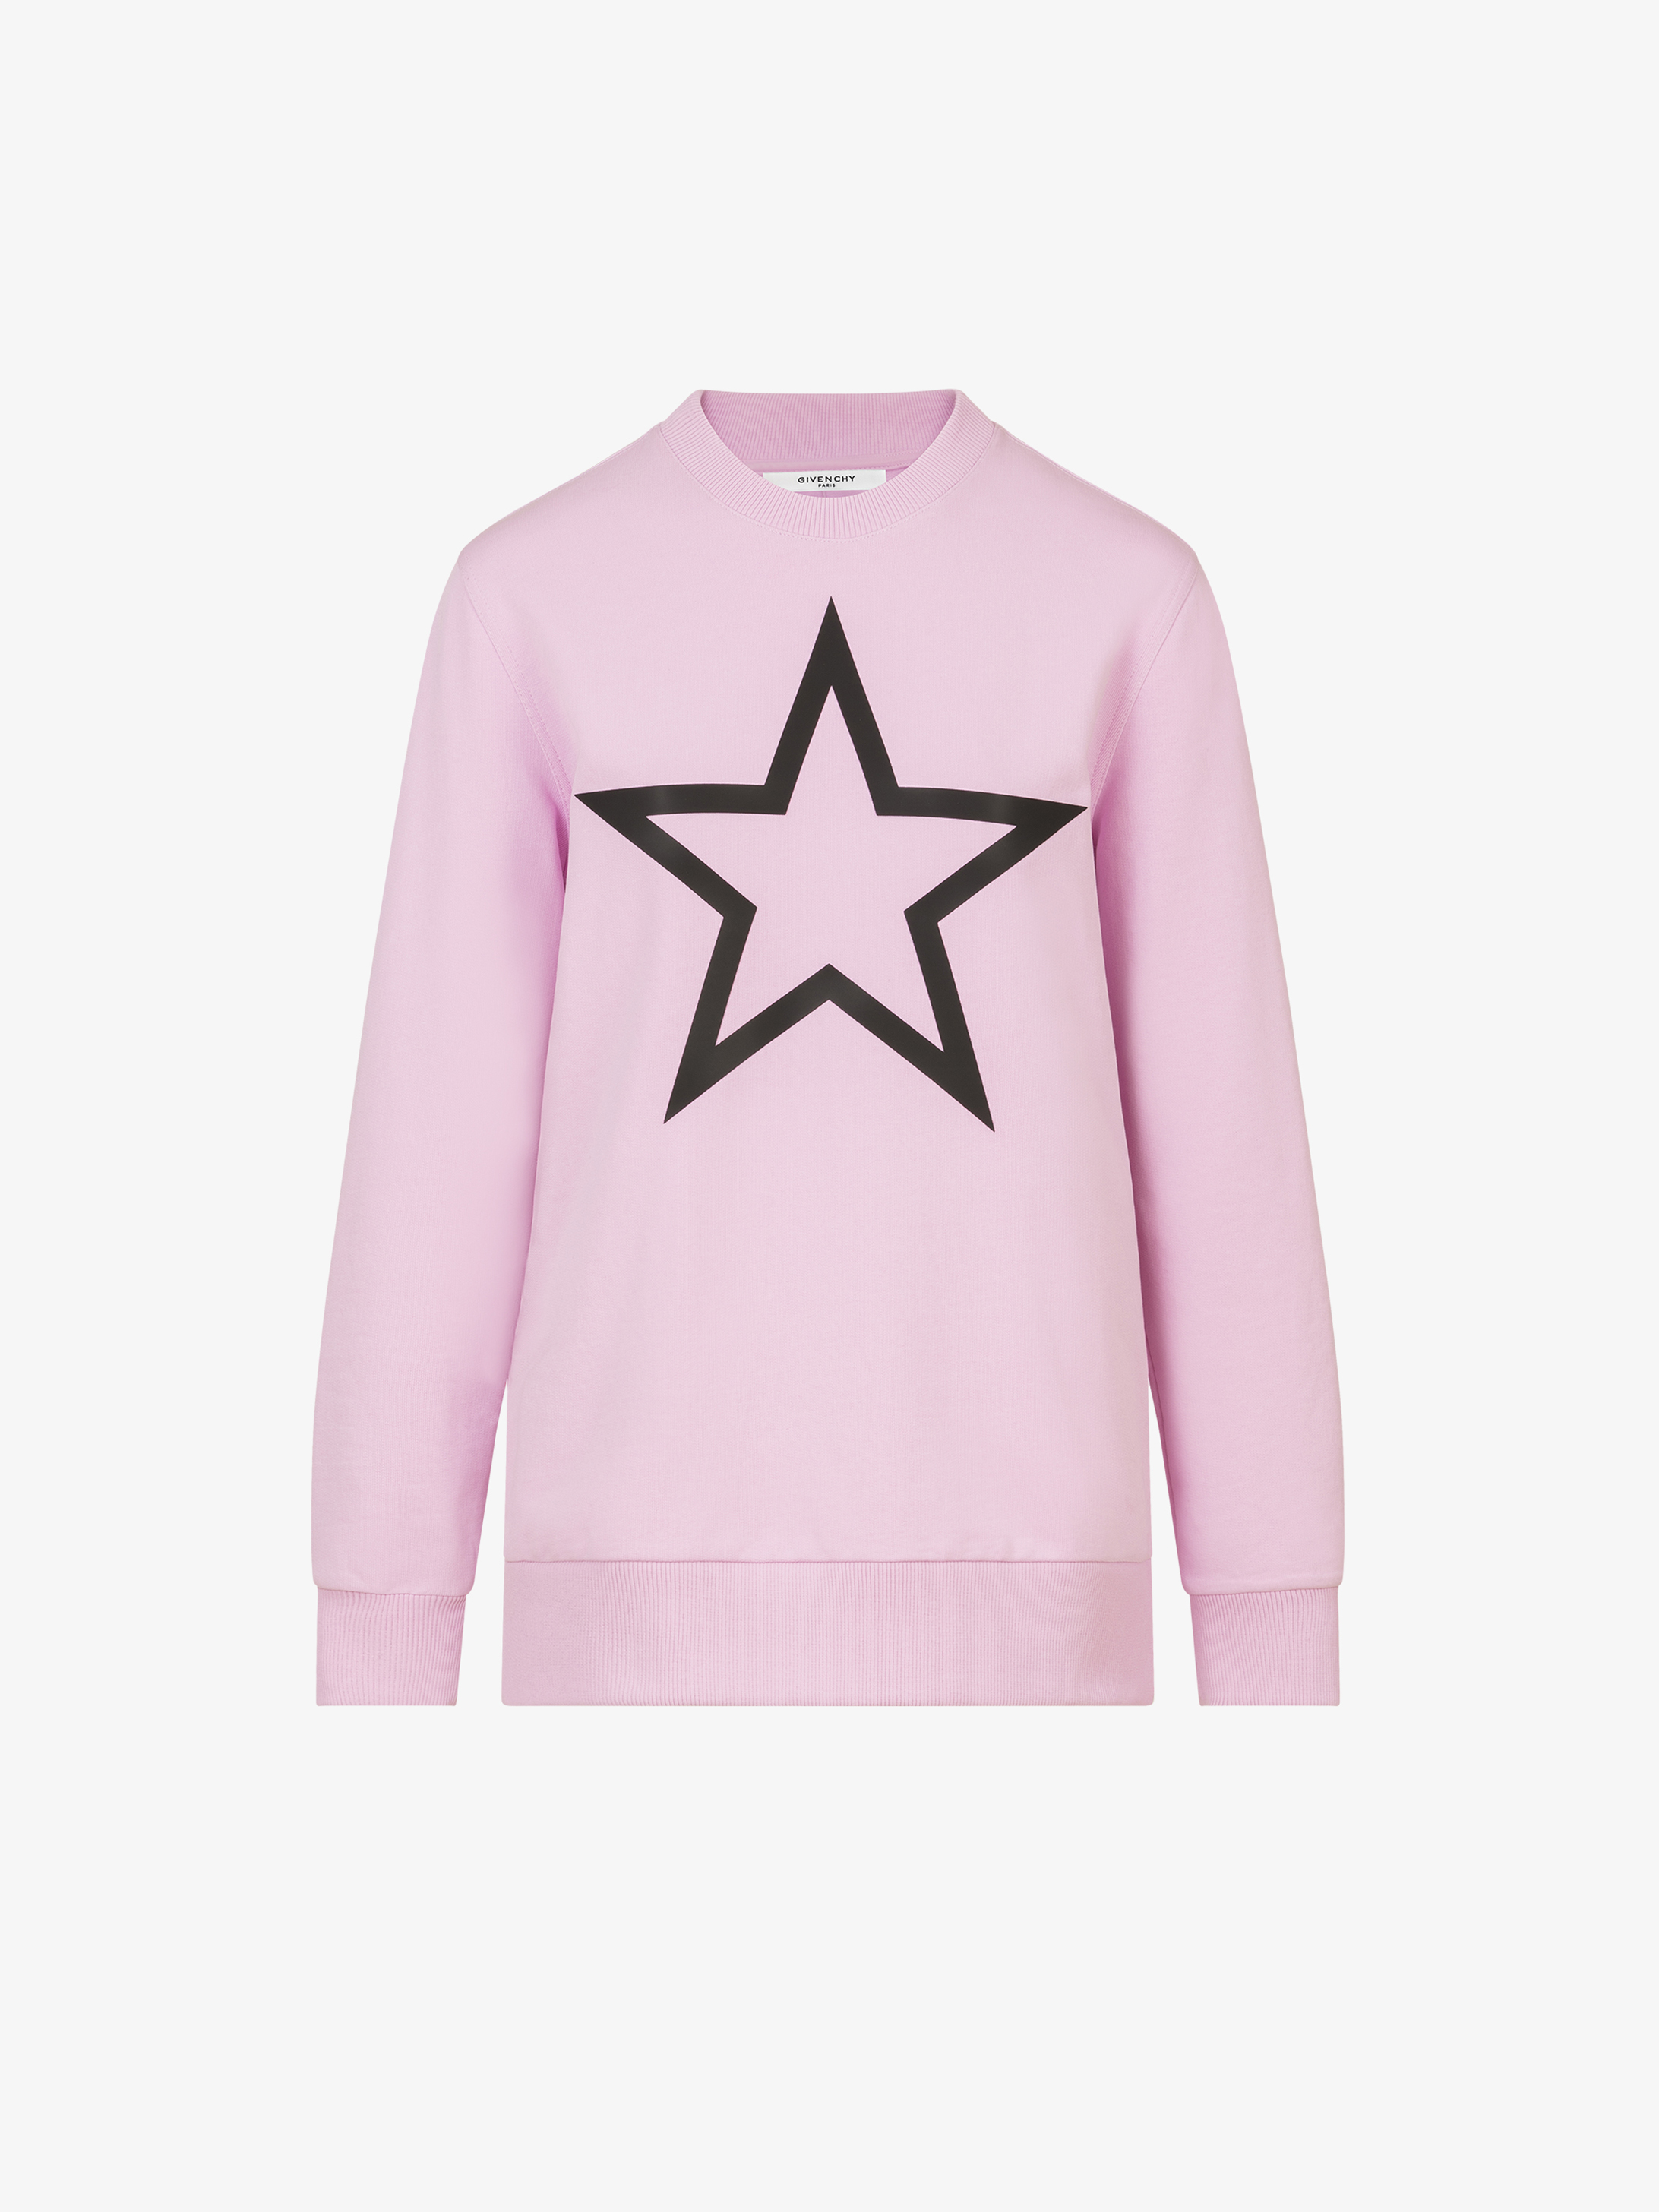 Sweatshirt oversized imprimé étoile